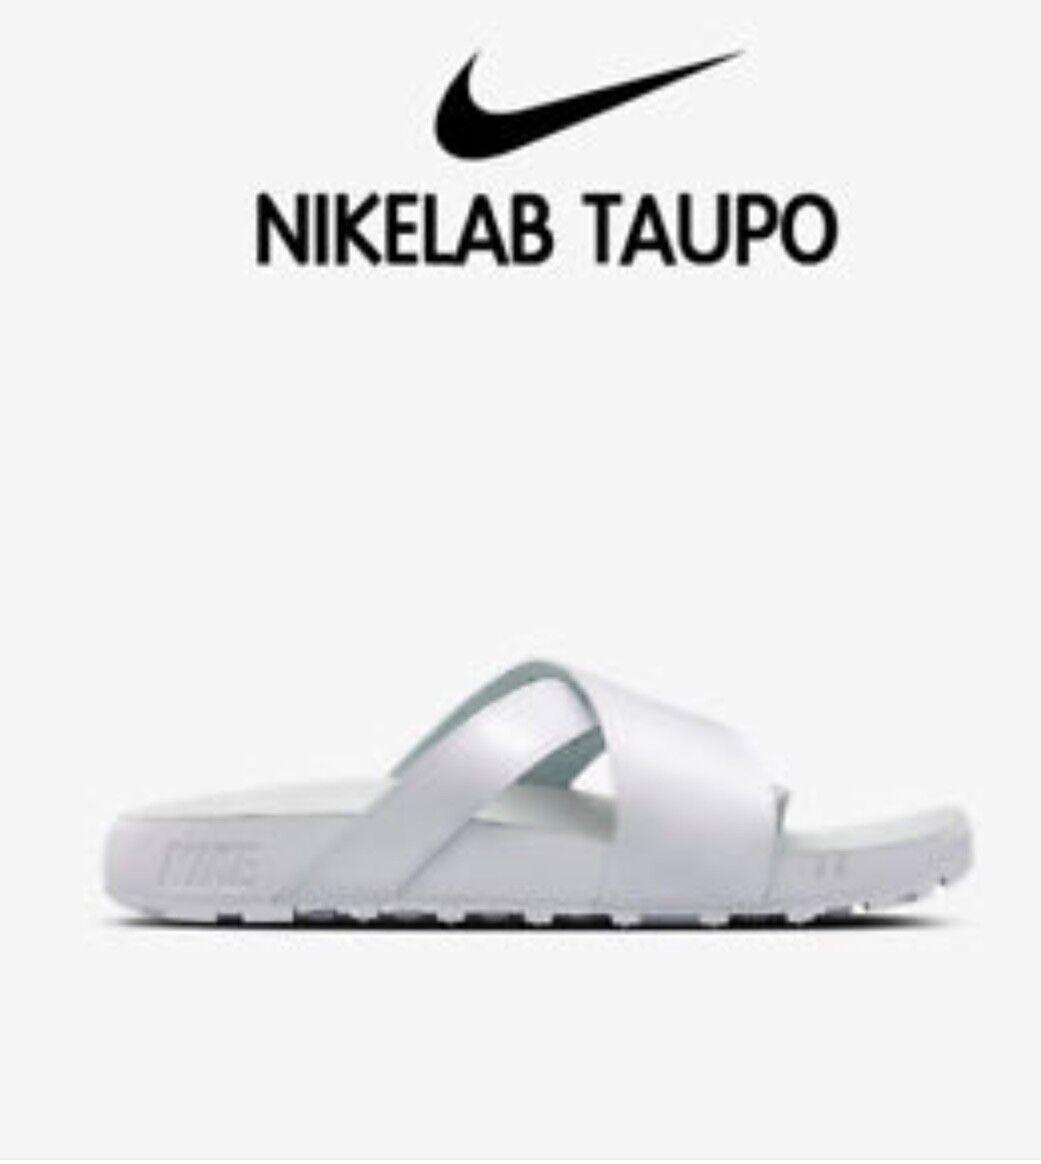 NikeLab Taupo Premium Patent Leder Sliders Sandales 849756-100 UK9/EU44/US10